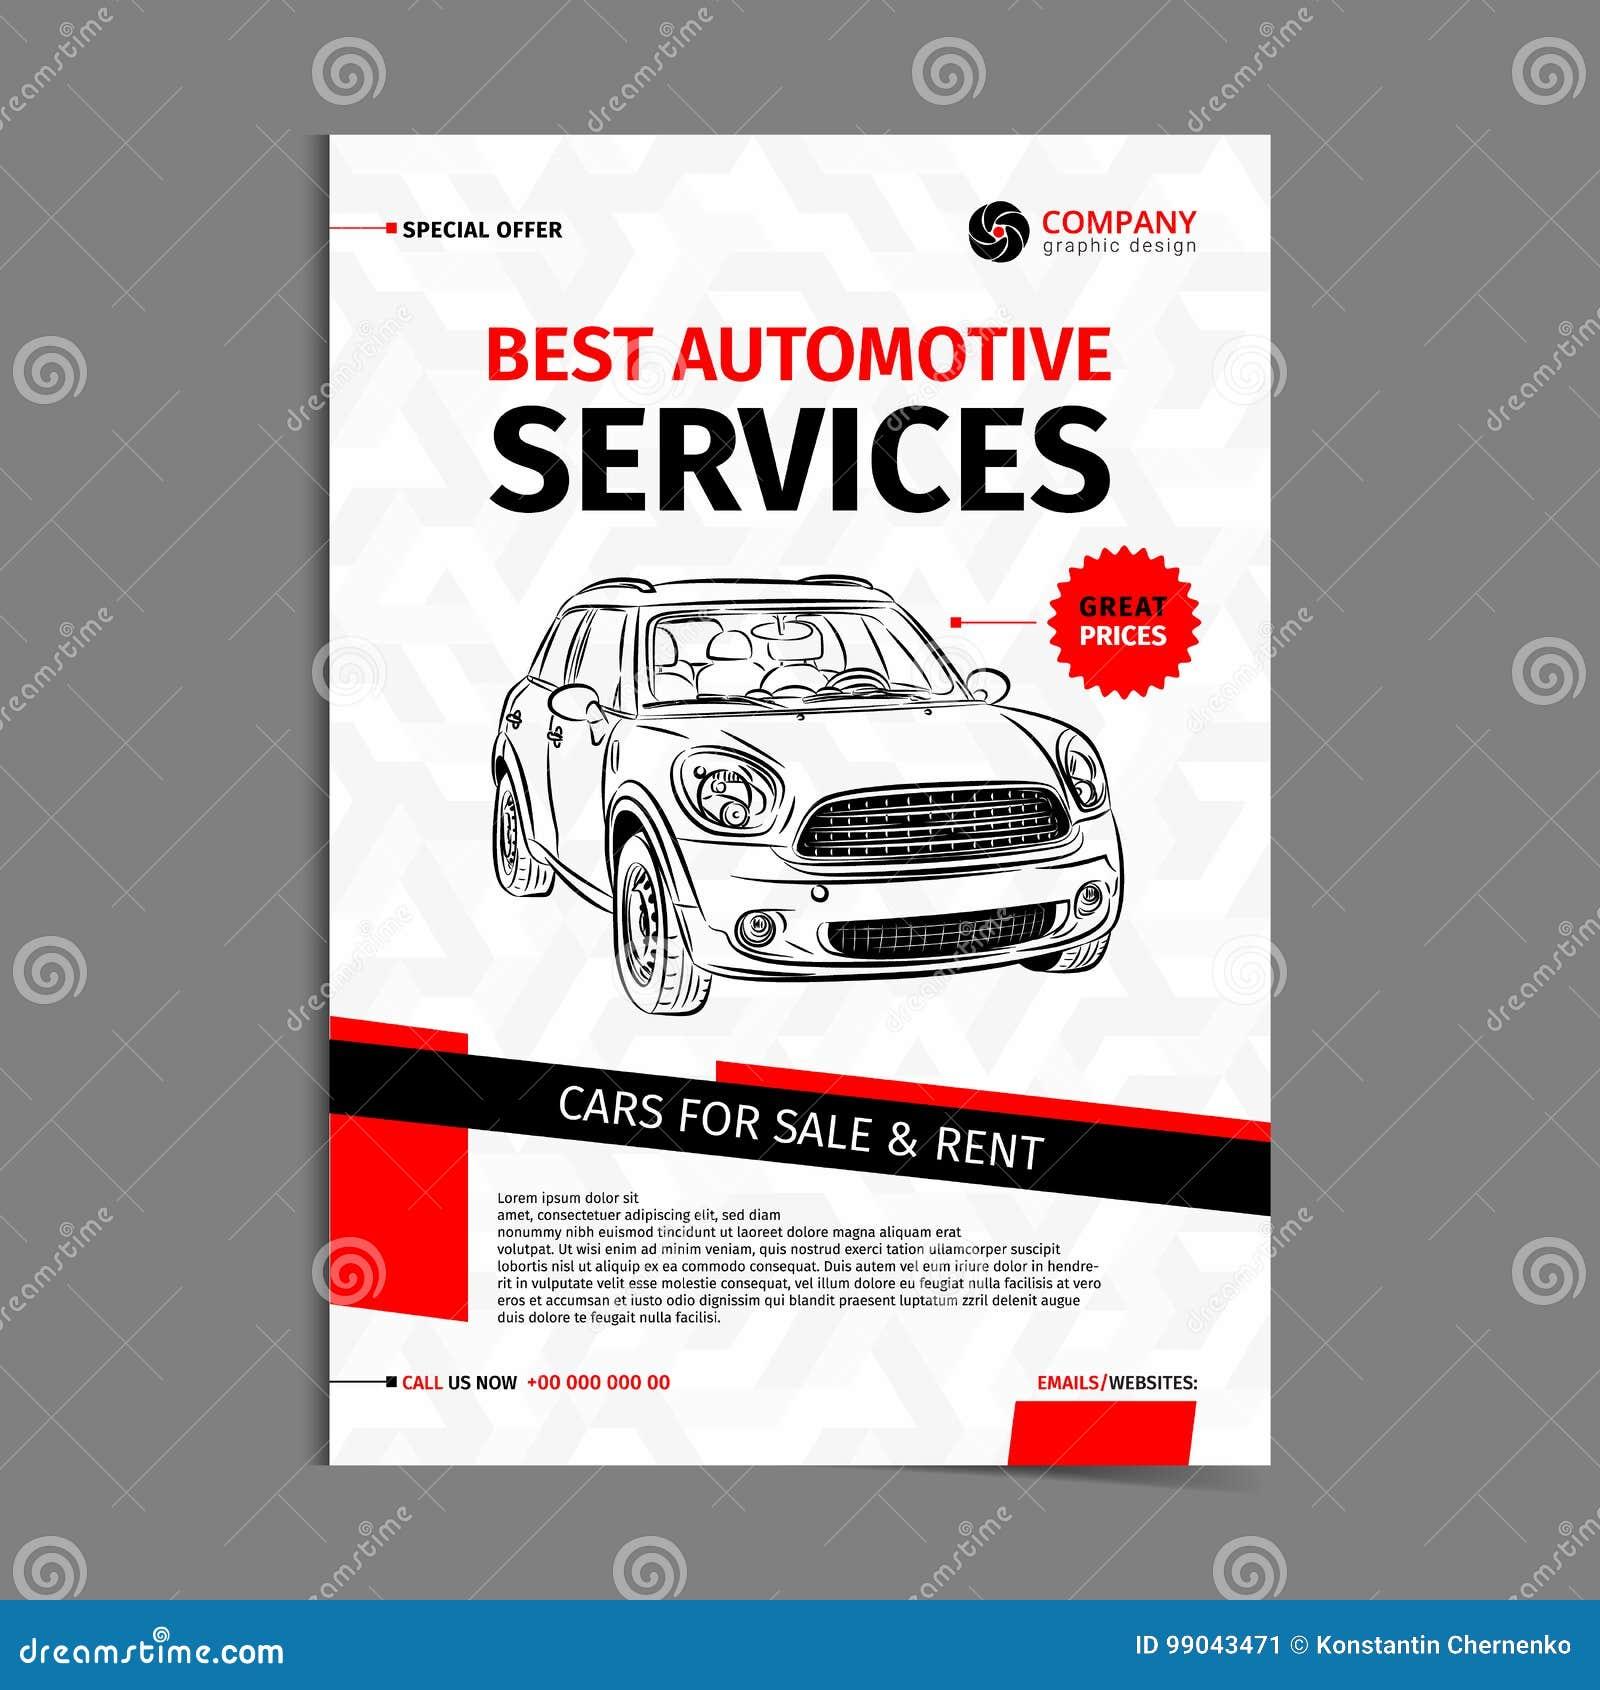 Automotive Services Layout Template Cars For Sale Rent Brochure Mockup Flyer Stock Vector Illustration Of Brochure Banner 99043471